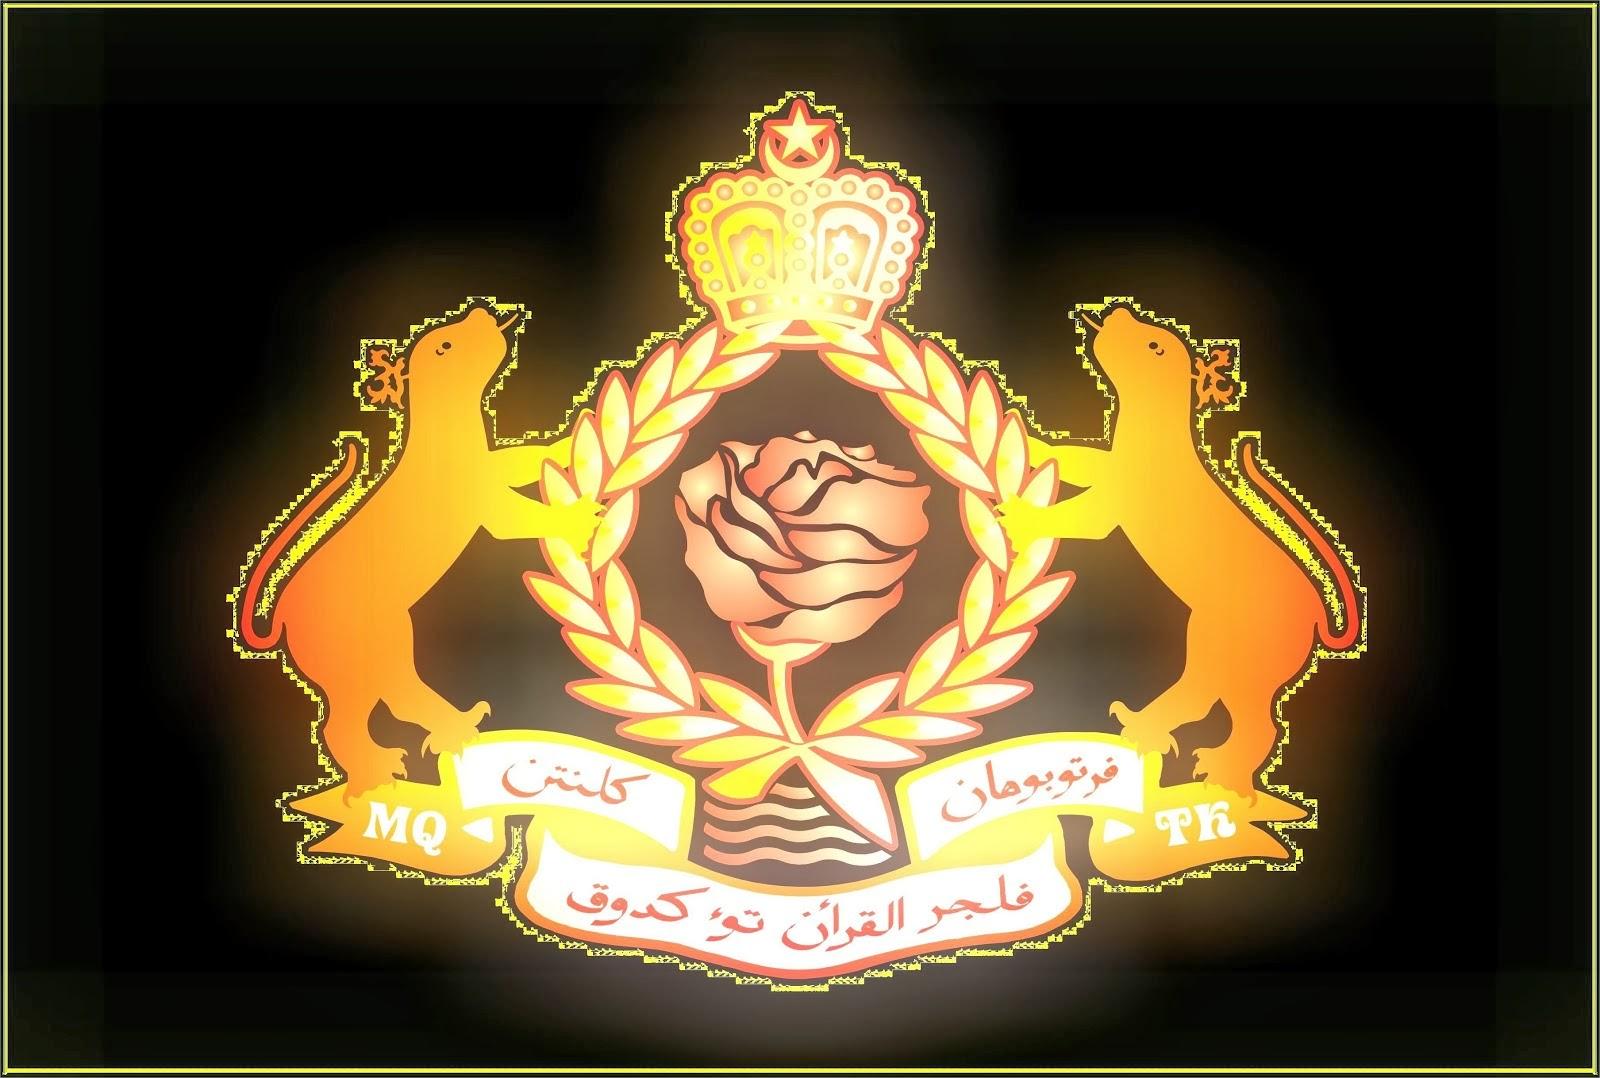 ROYAL MQTK (RMAO)